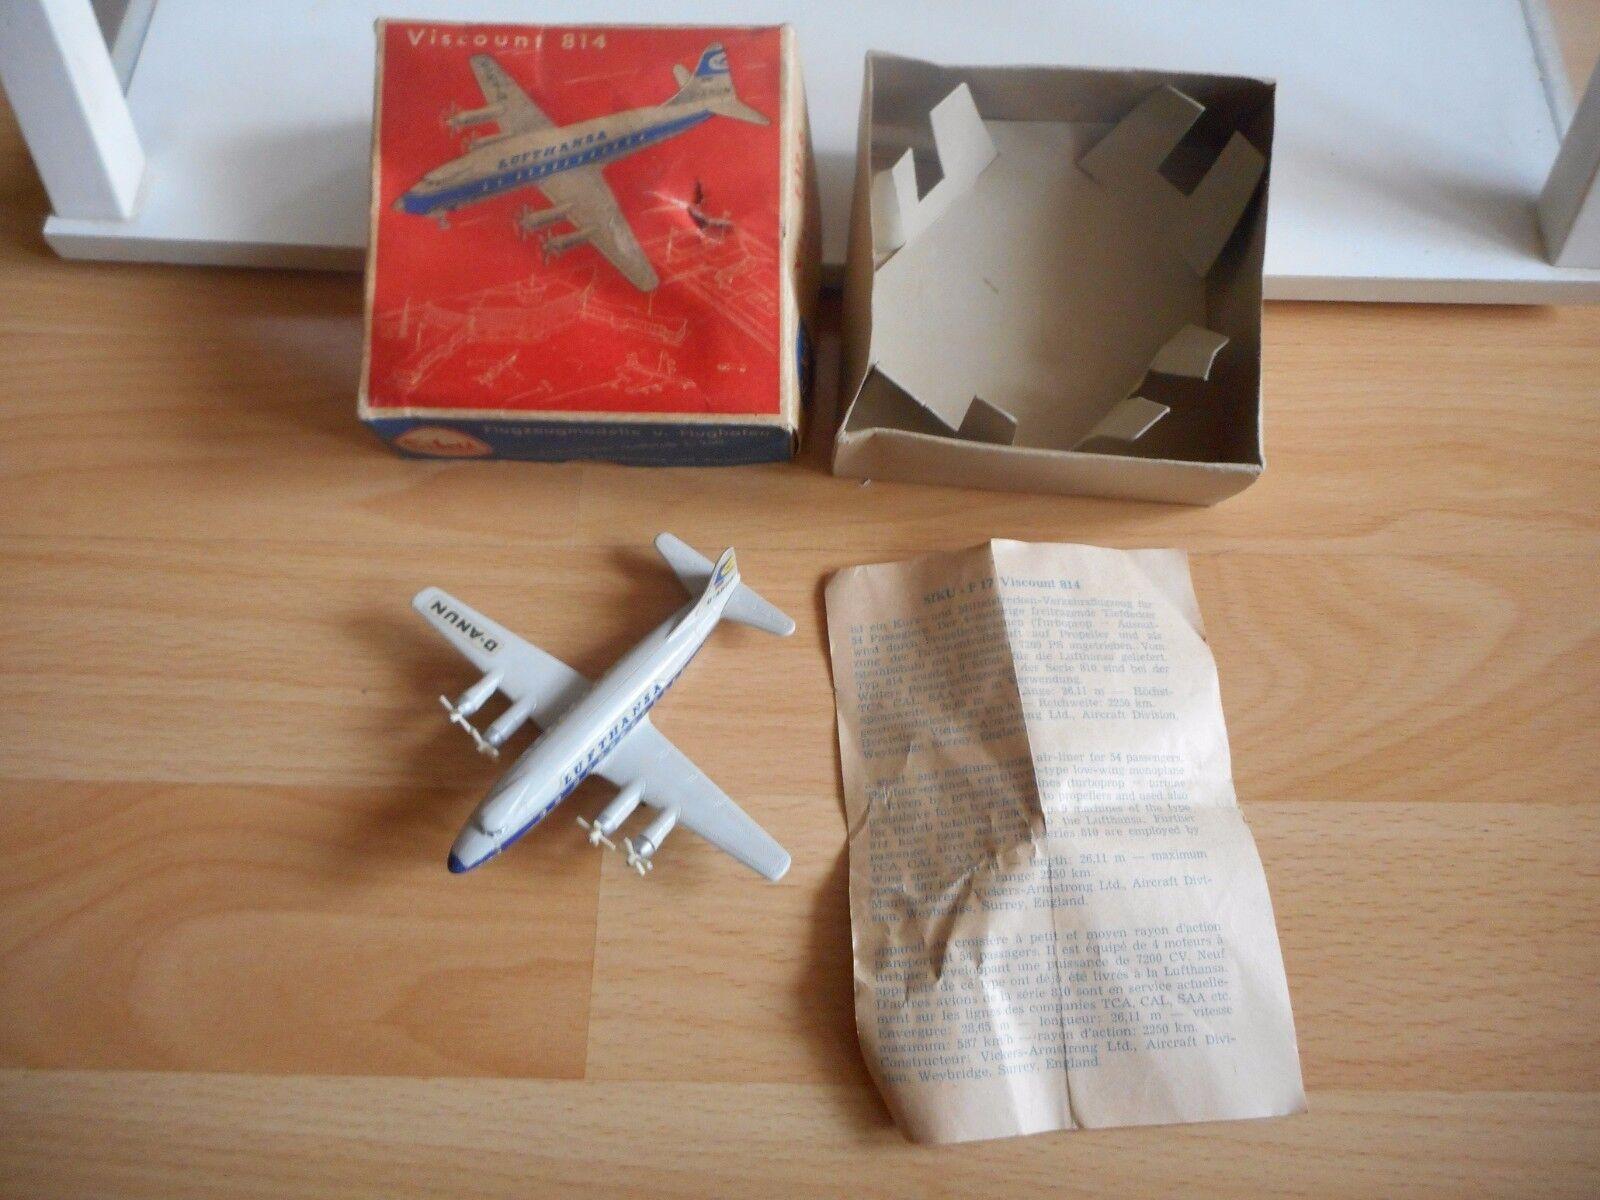 Siku Airplane Viscount 814  Lufthansa  in grau in Box (siku nr  F 17 a)